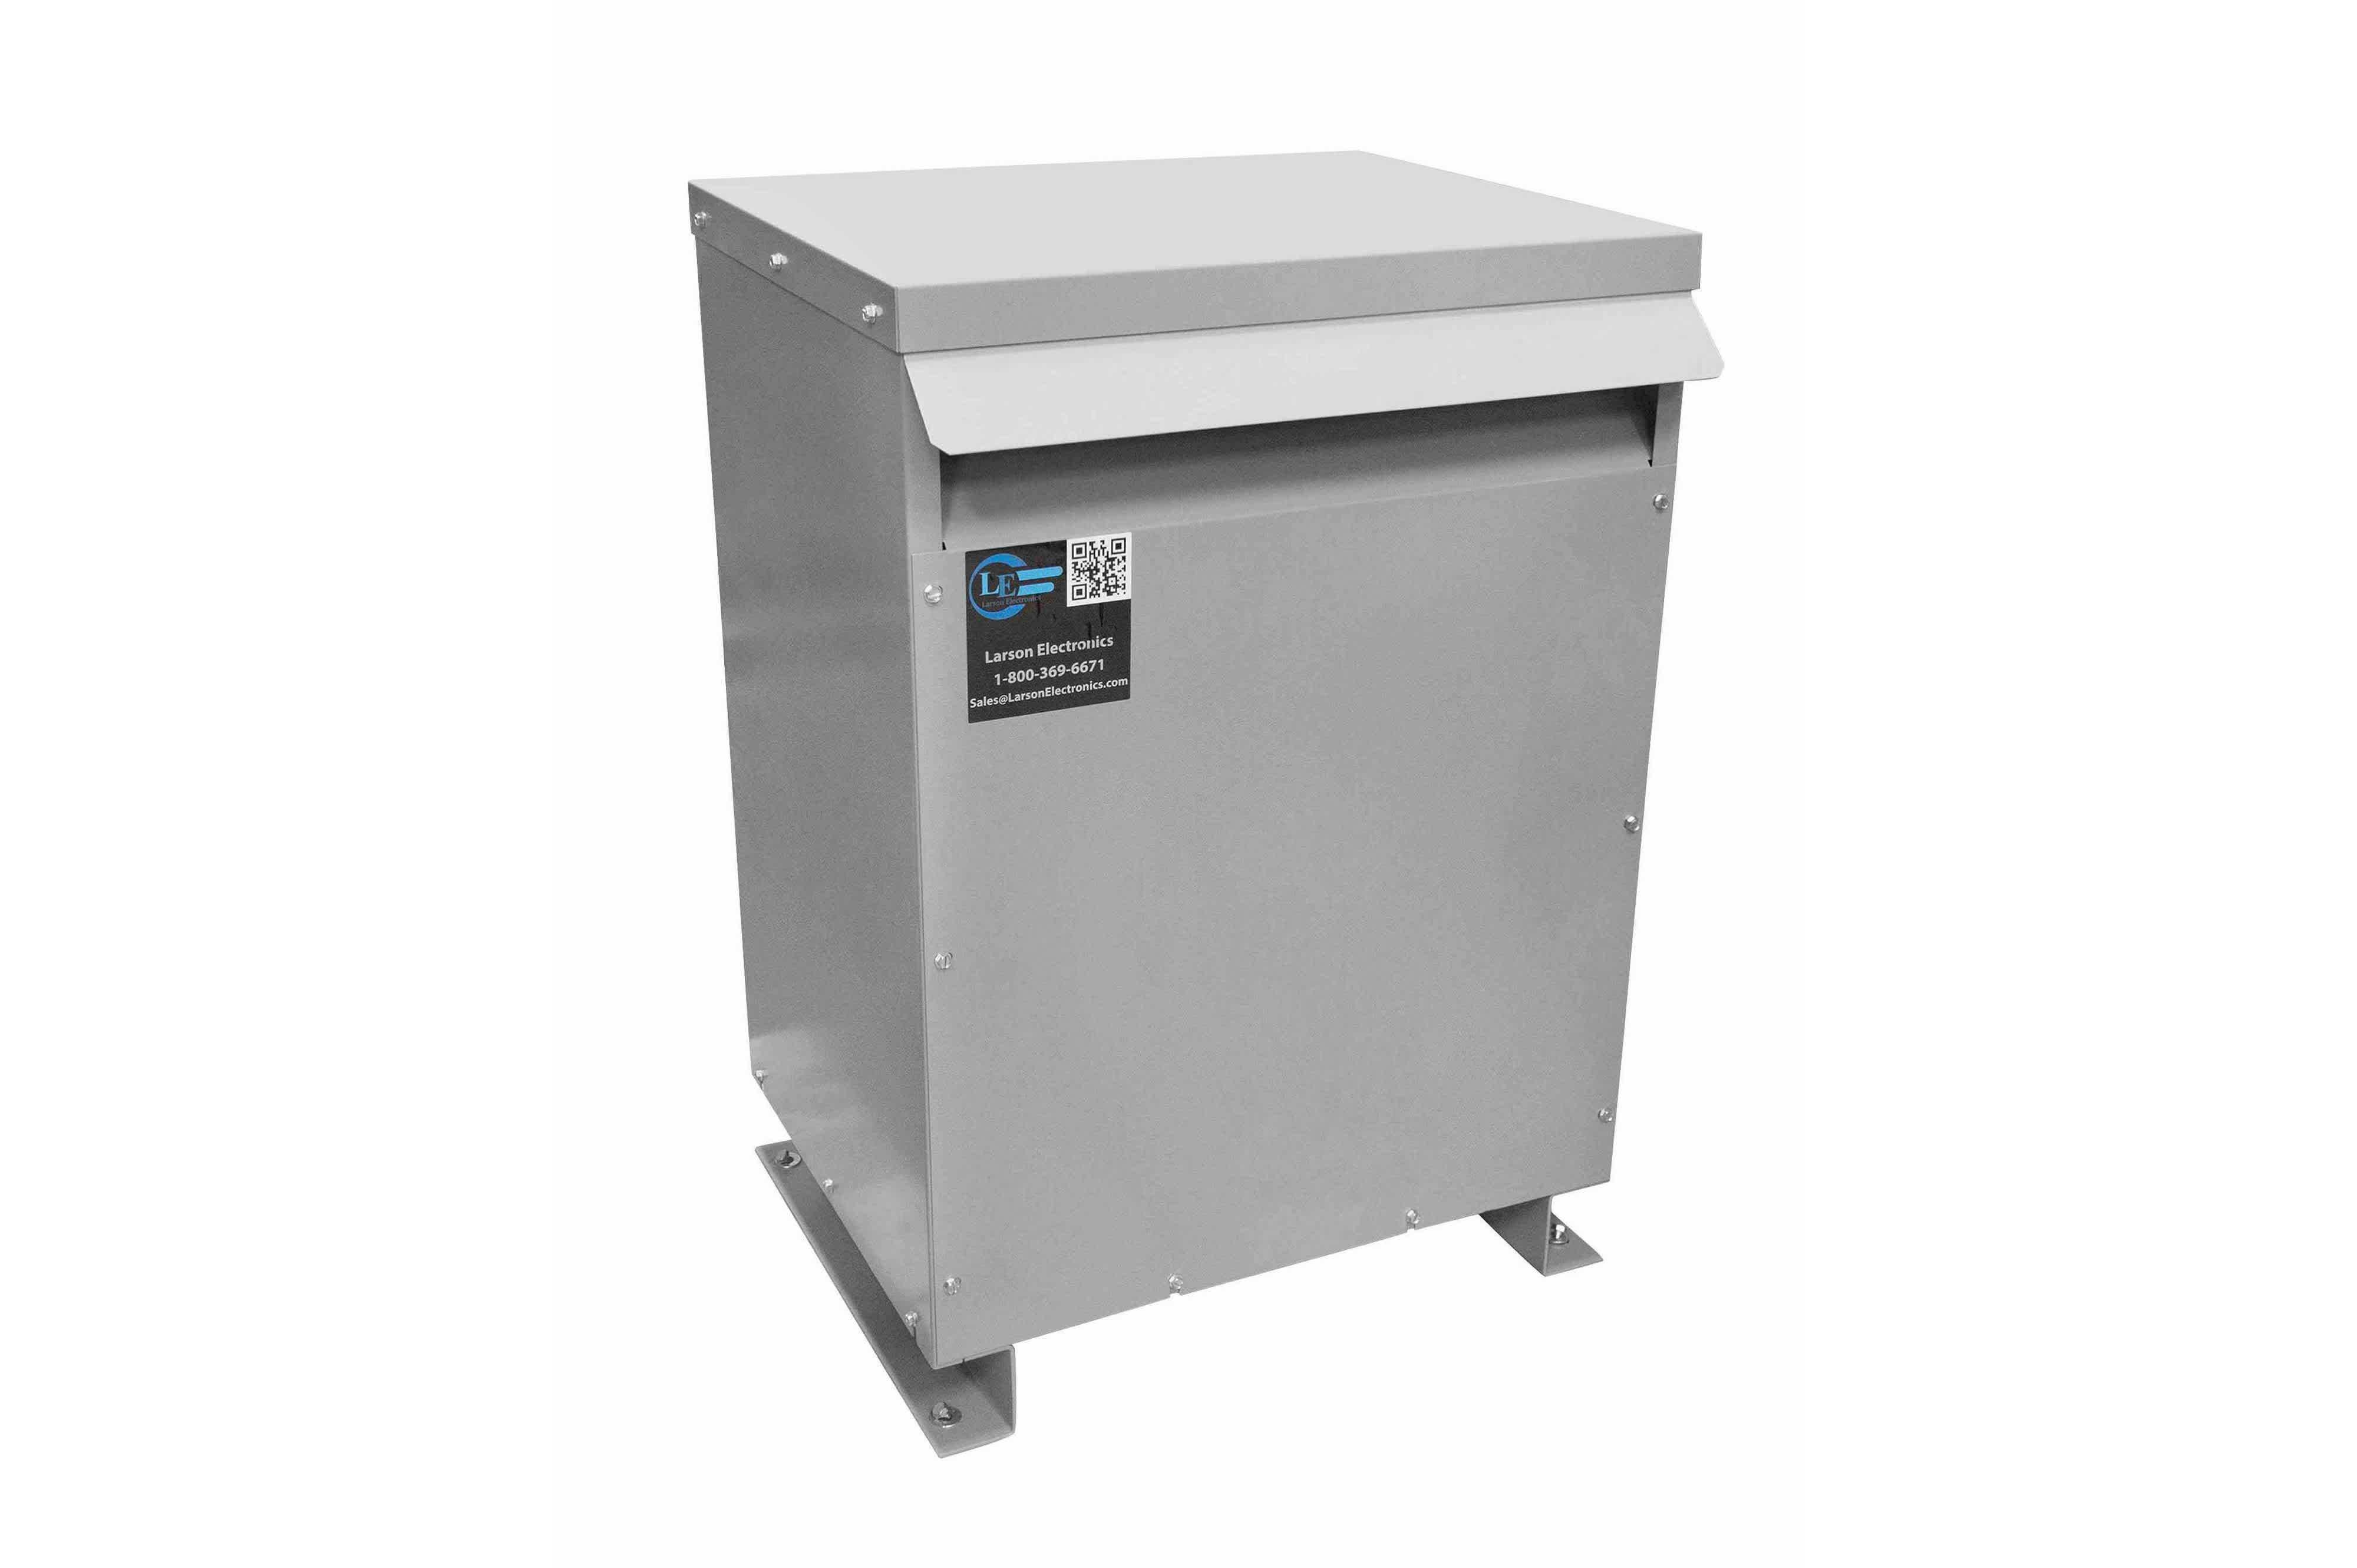 112.5 kVA 3PH DOE Transformer, 480V Delta Primary, 380Y/220 Wye-N Secondary, N3R, Ventilated, 60 Hz